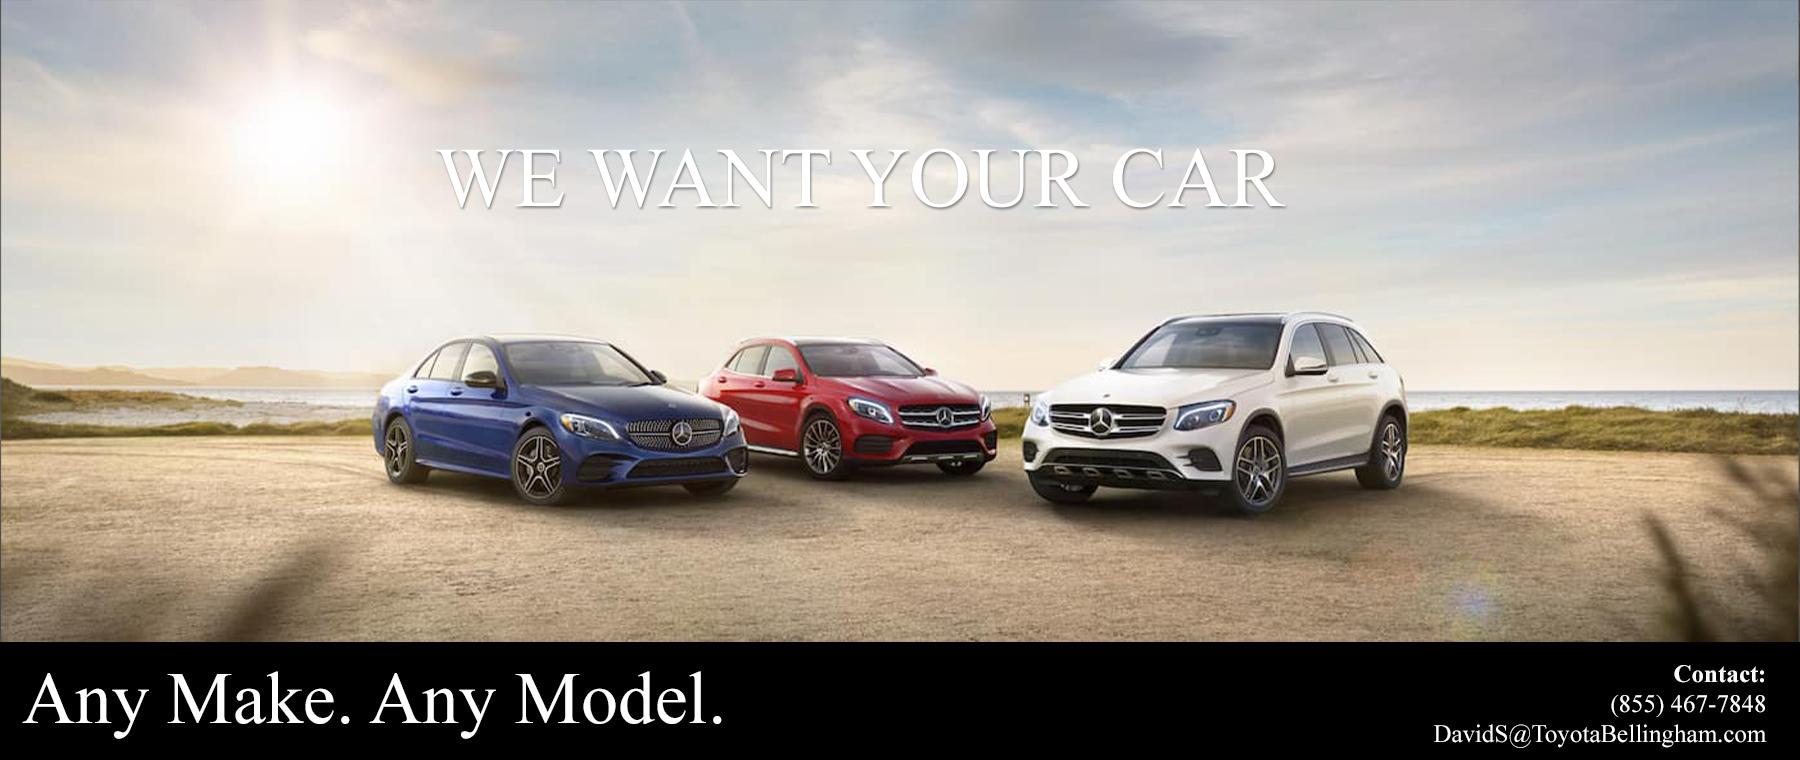 We want your car Benz Desktop